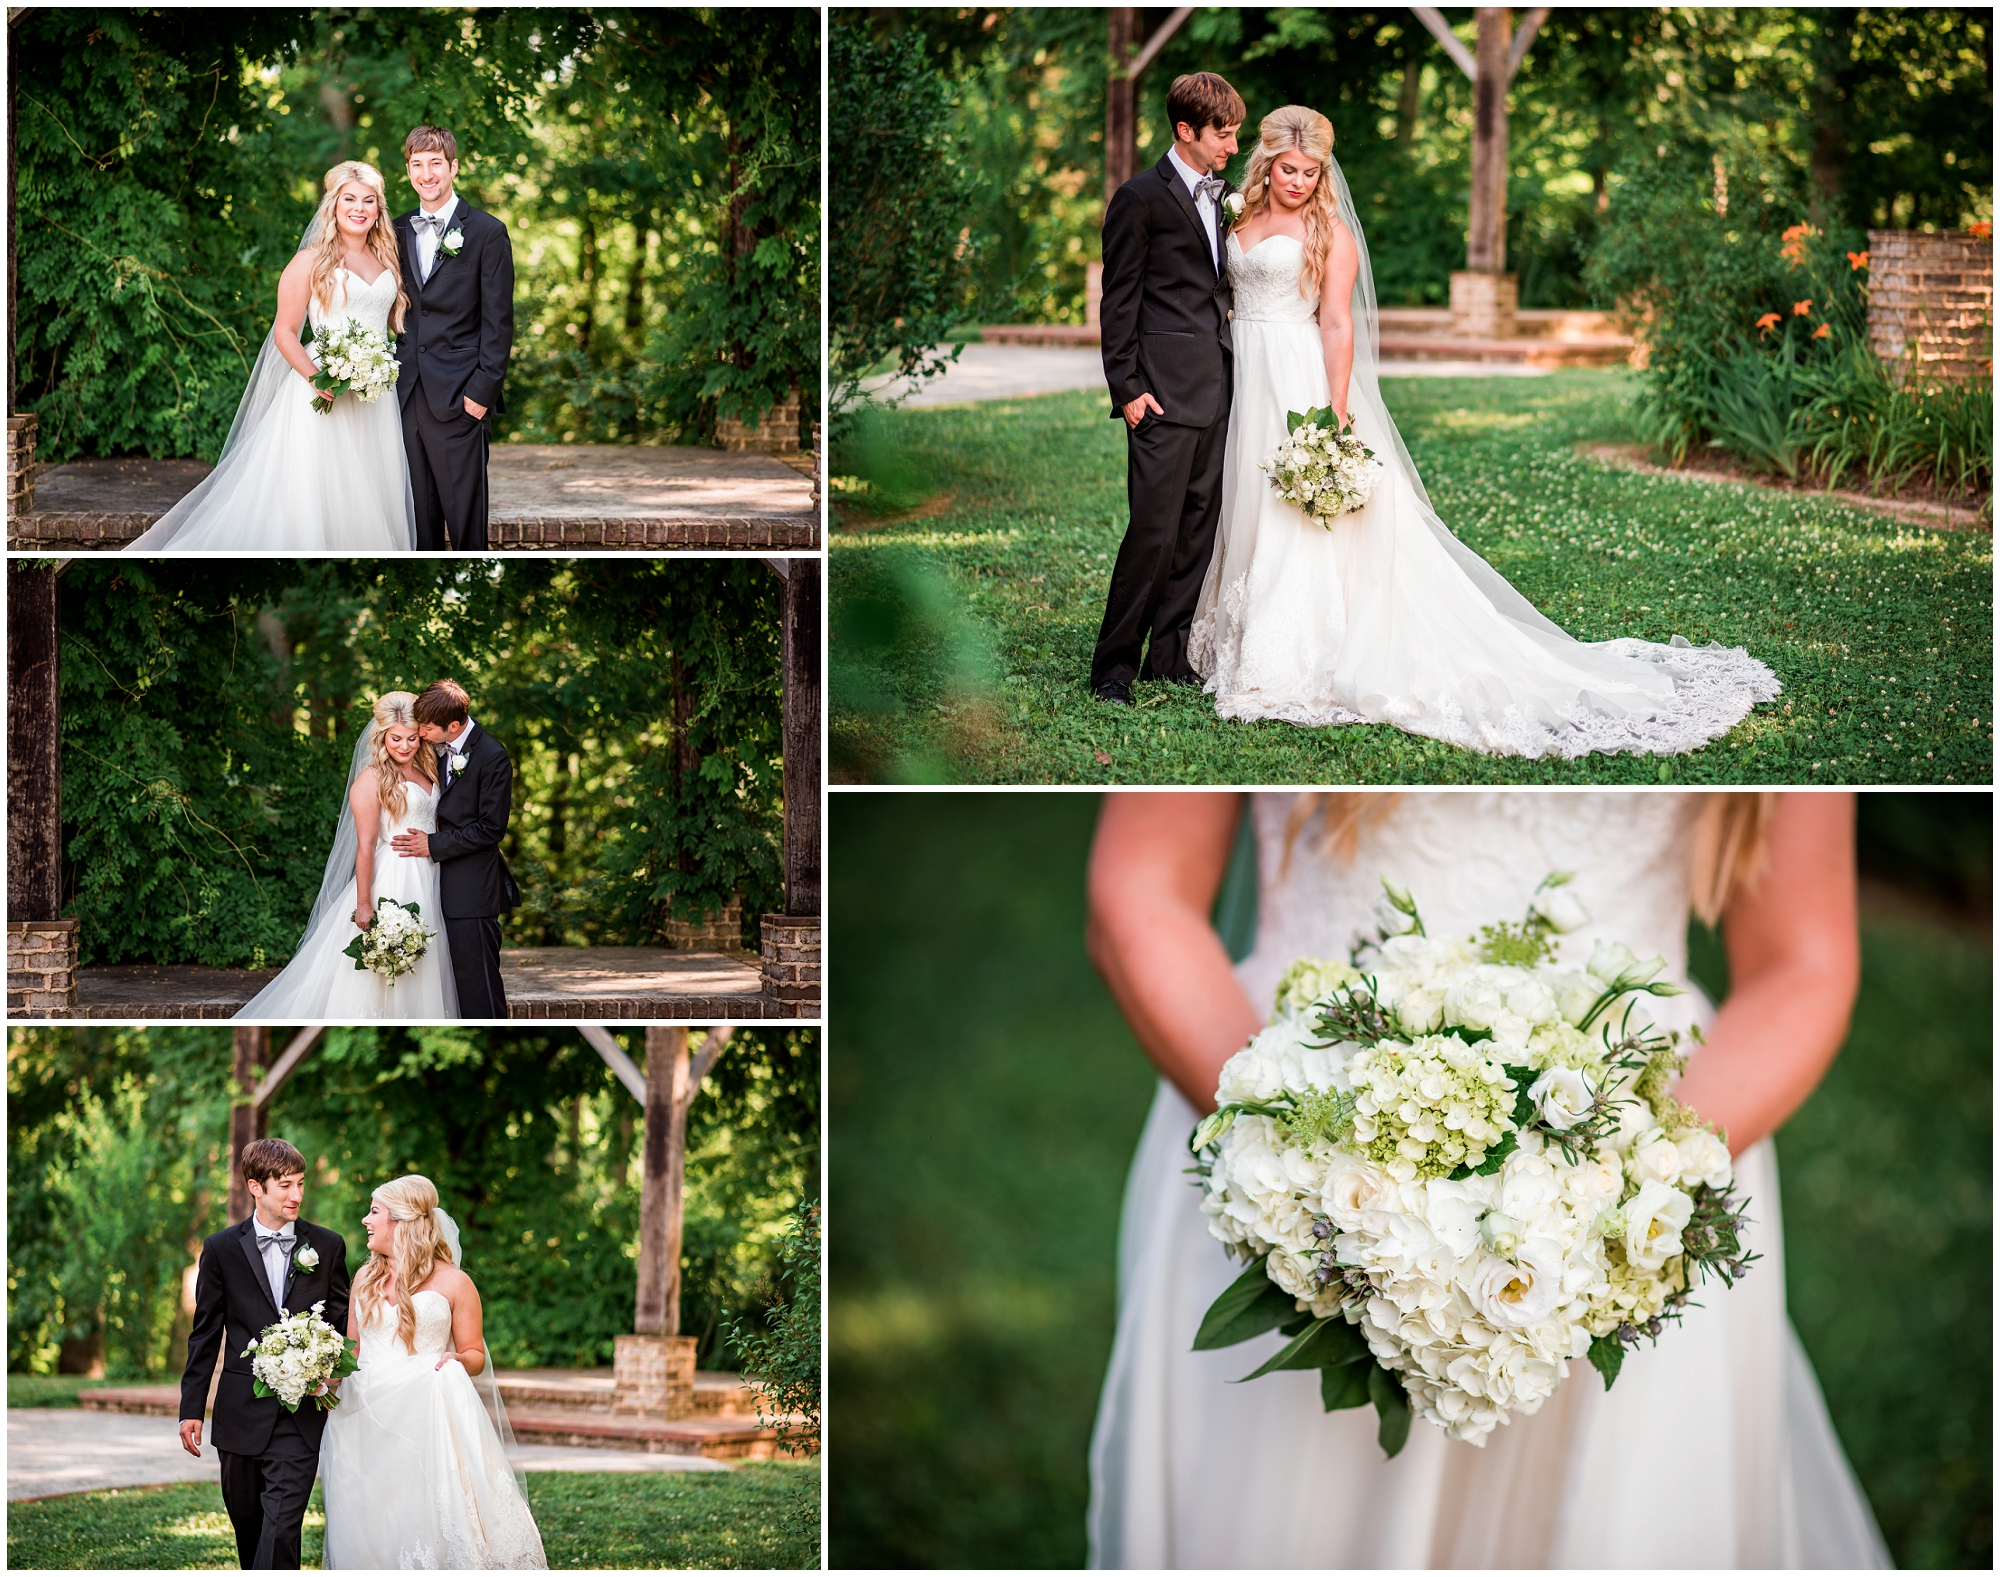 destyn_josh_casons_cove_wedding-0826.jpg